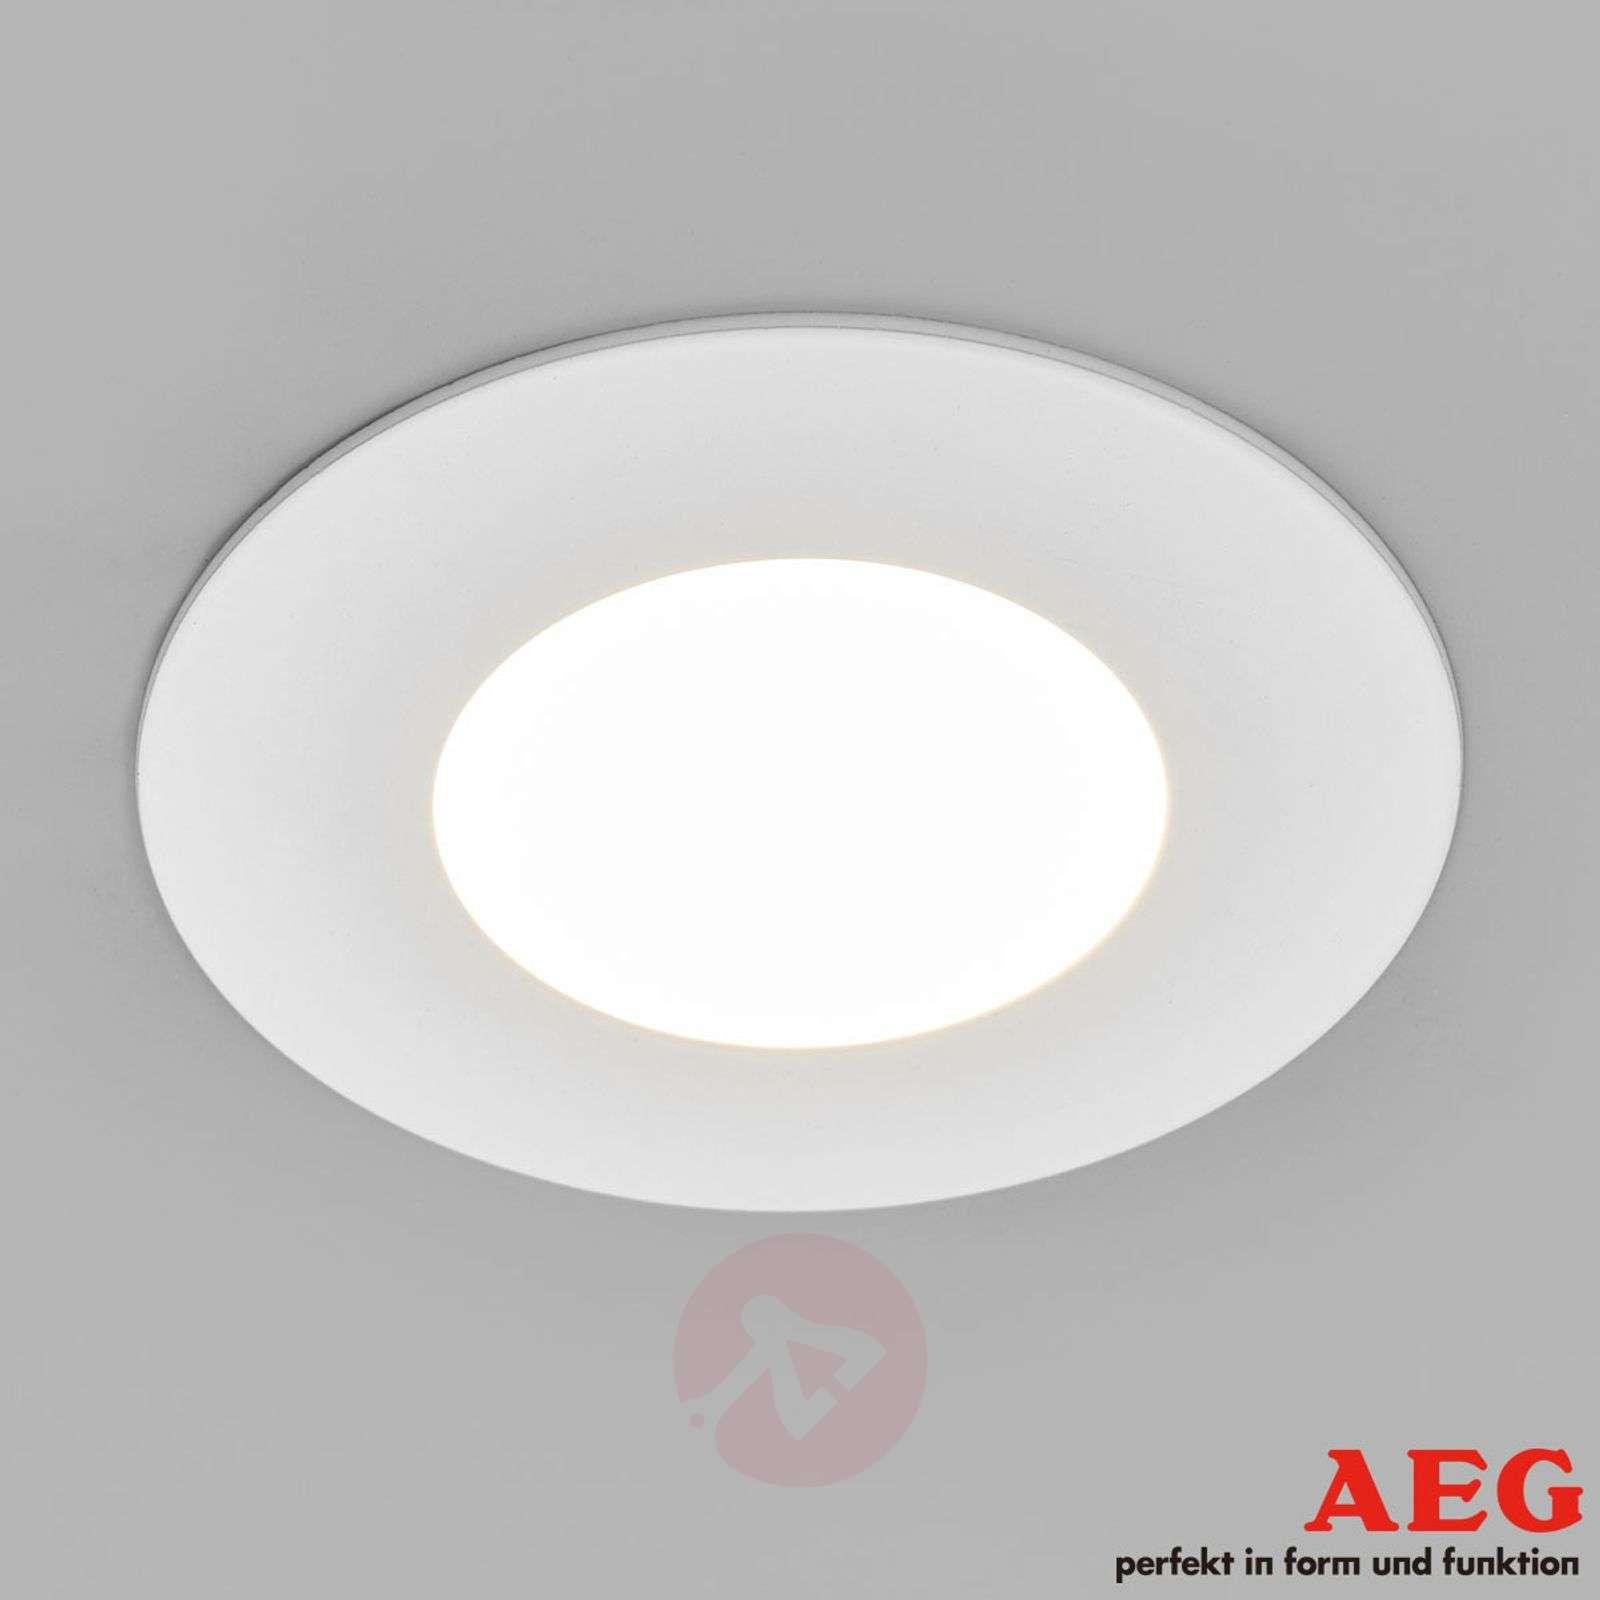 Set of 3 Orbita LED recessed lights, warm white-3057045-01